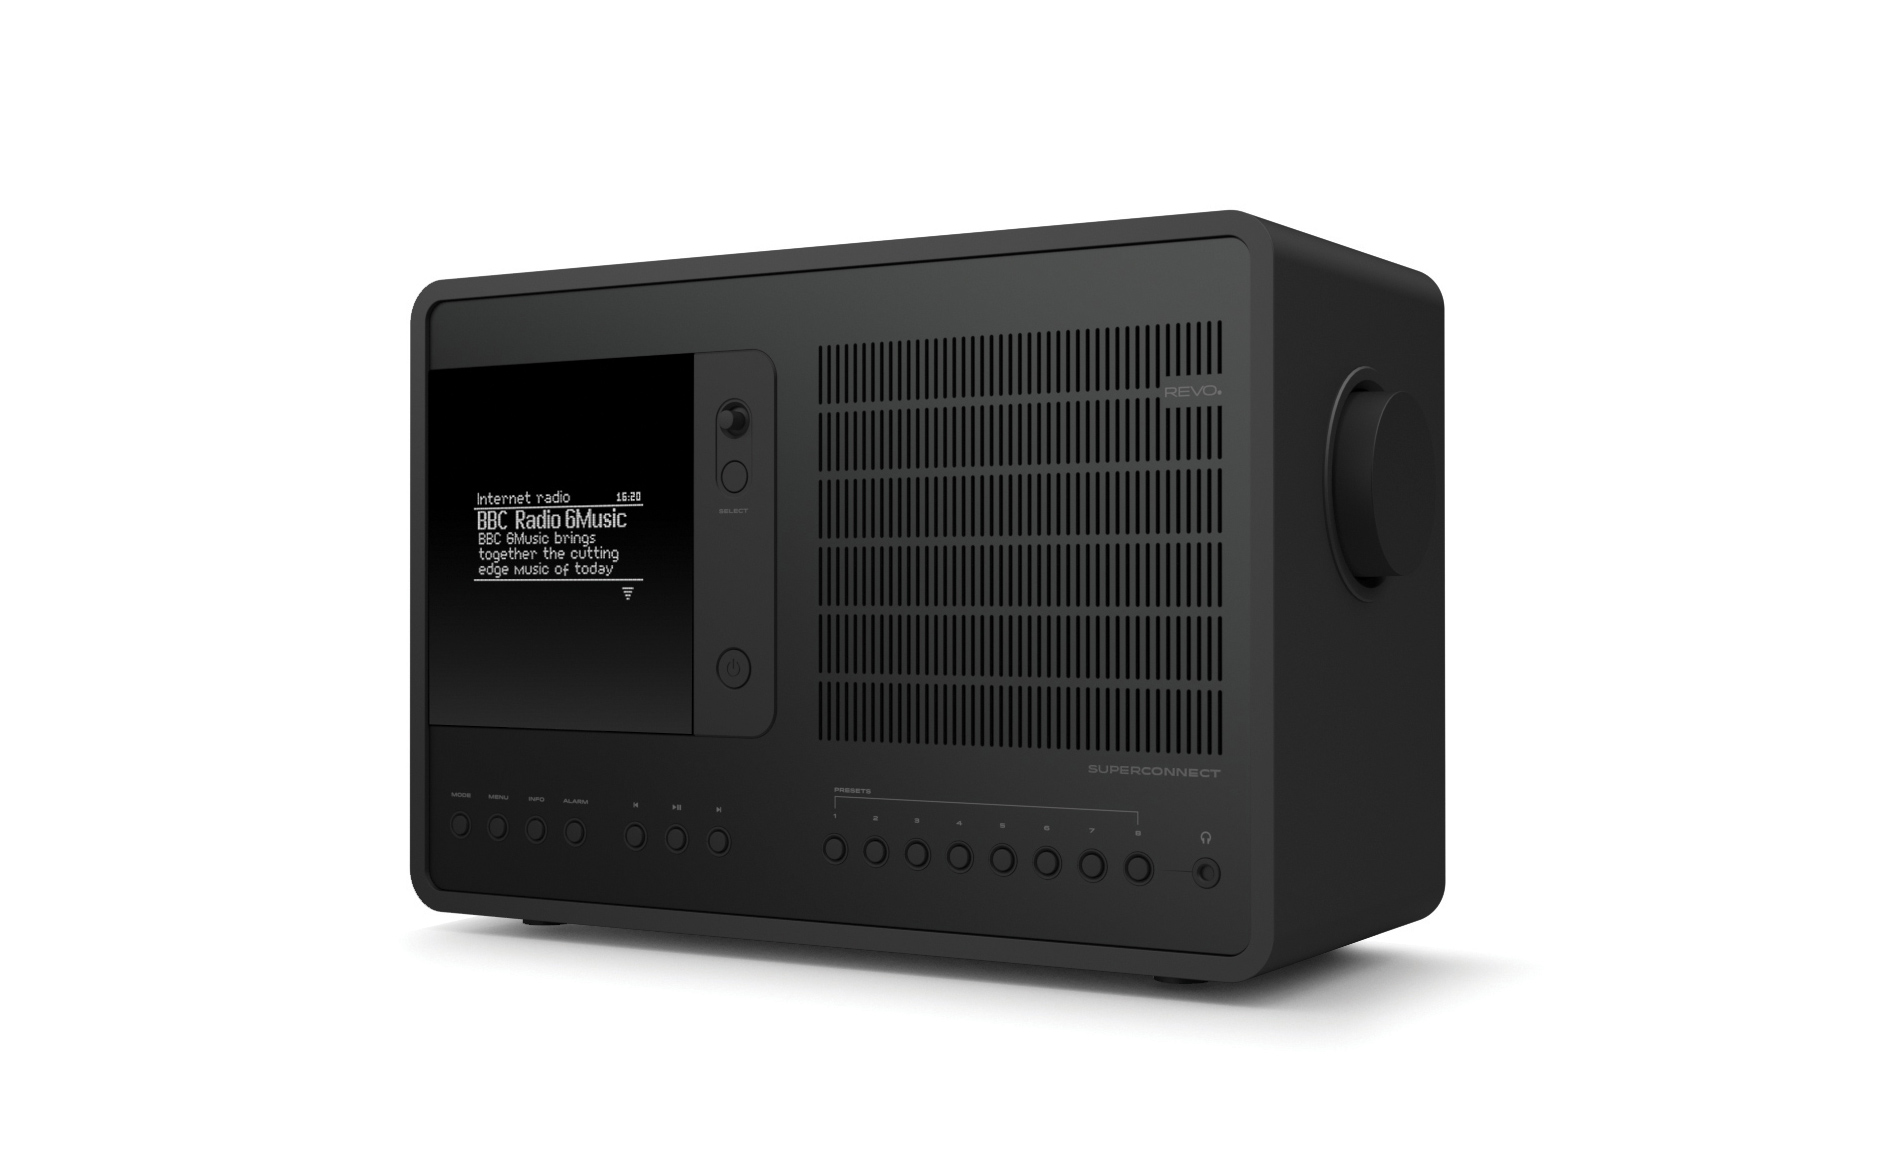 Revo SuperConnect